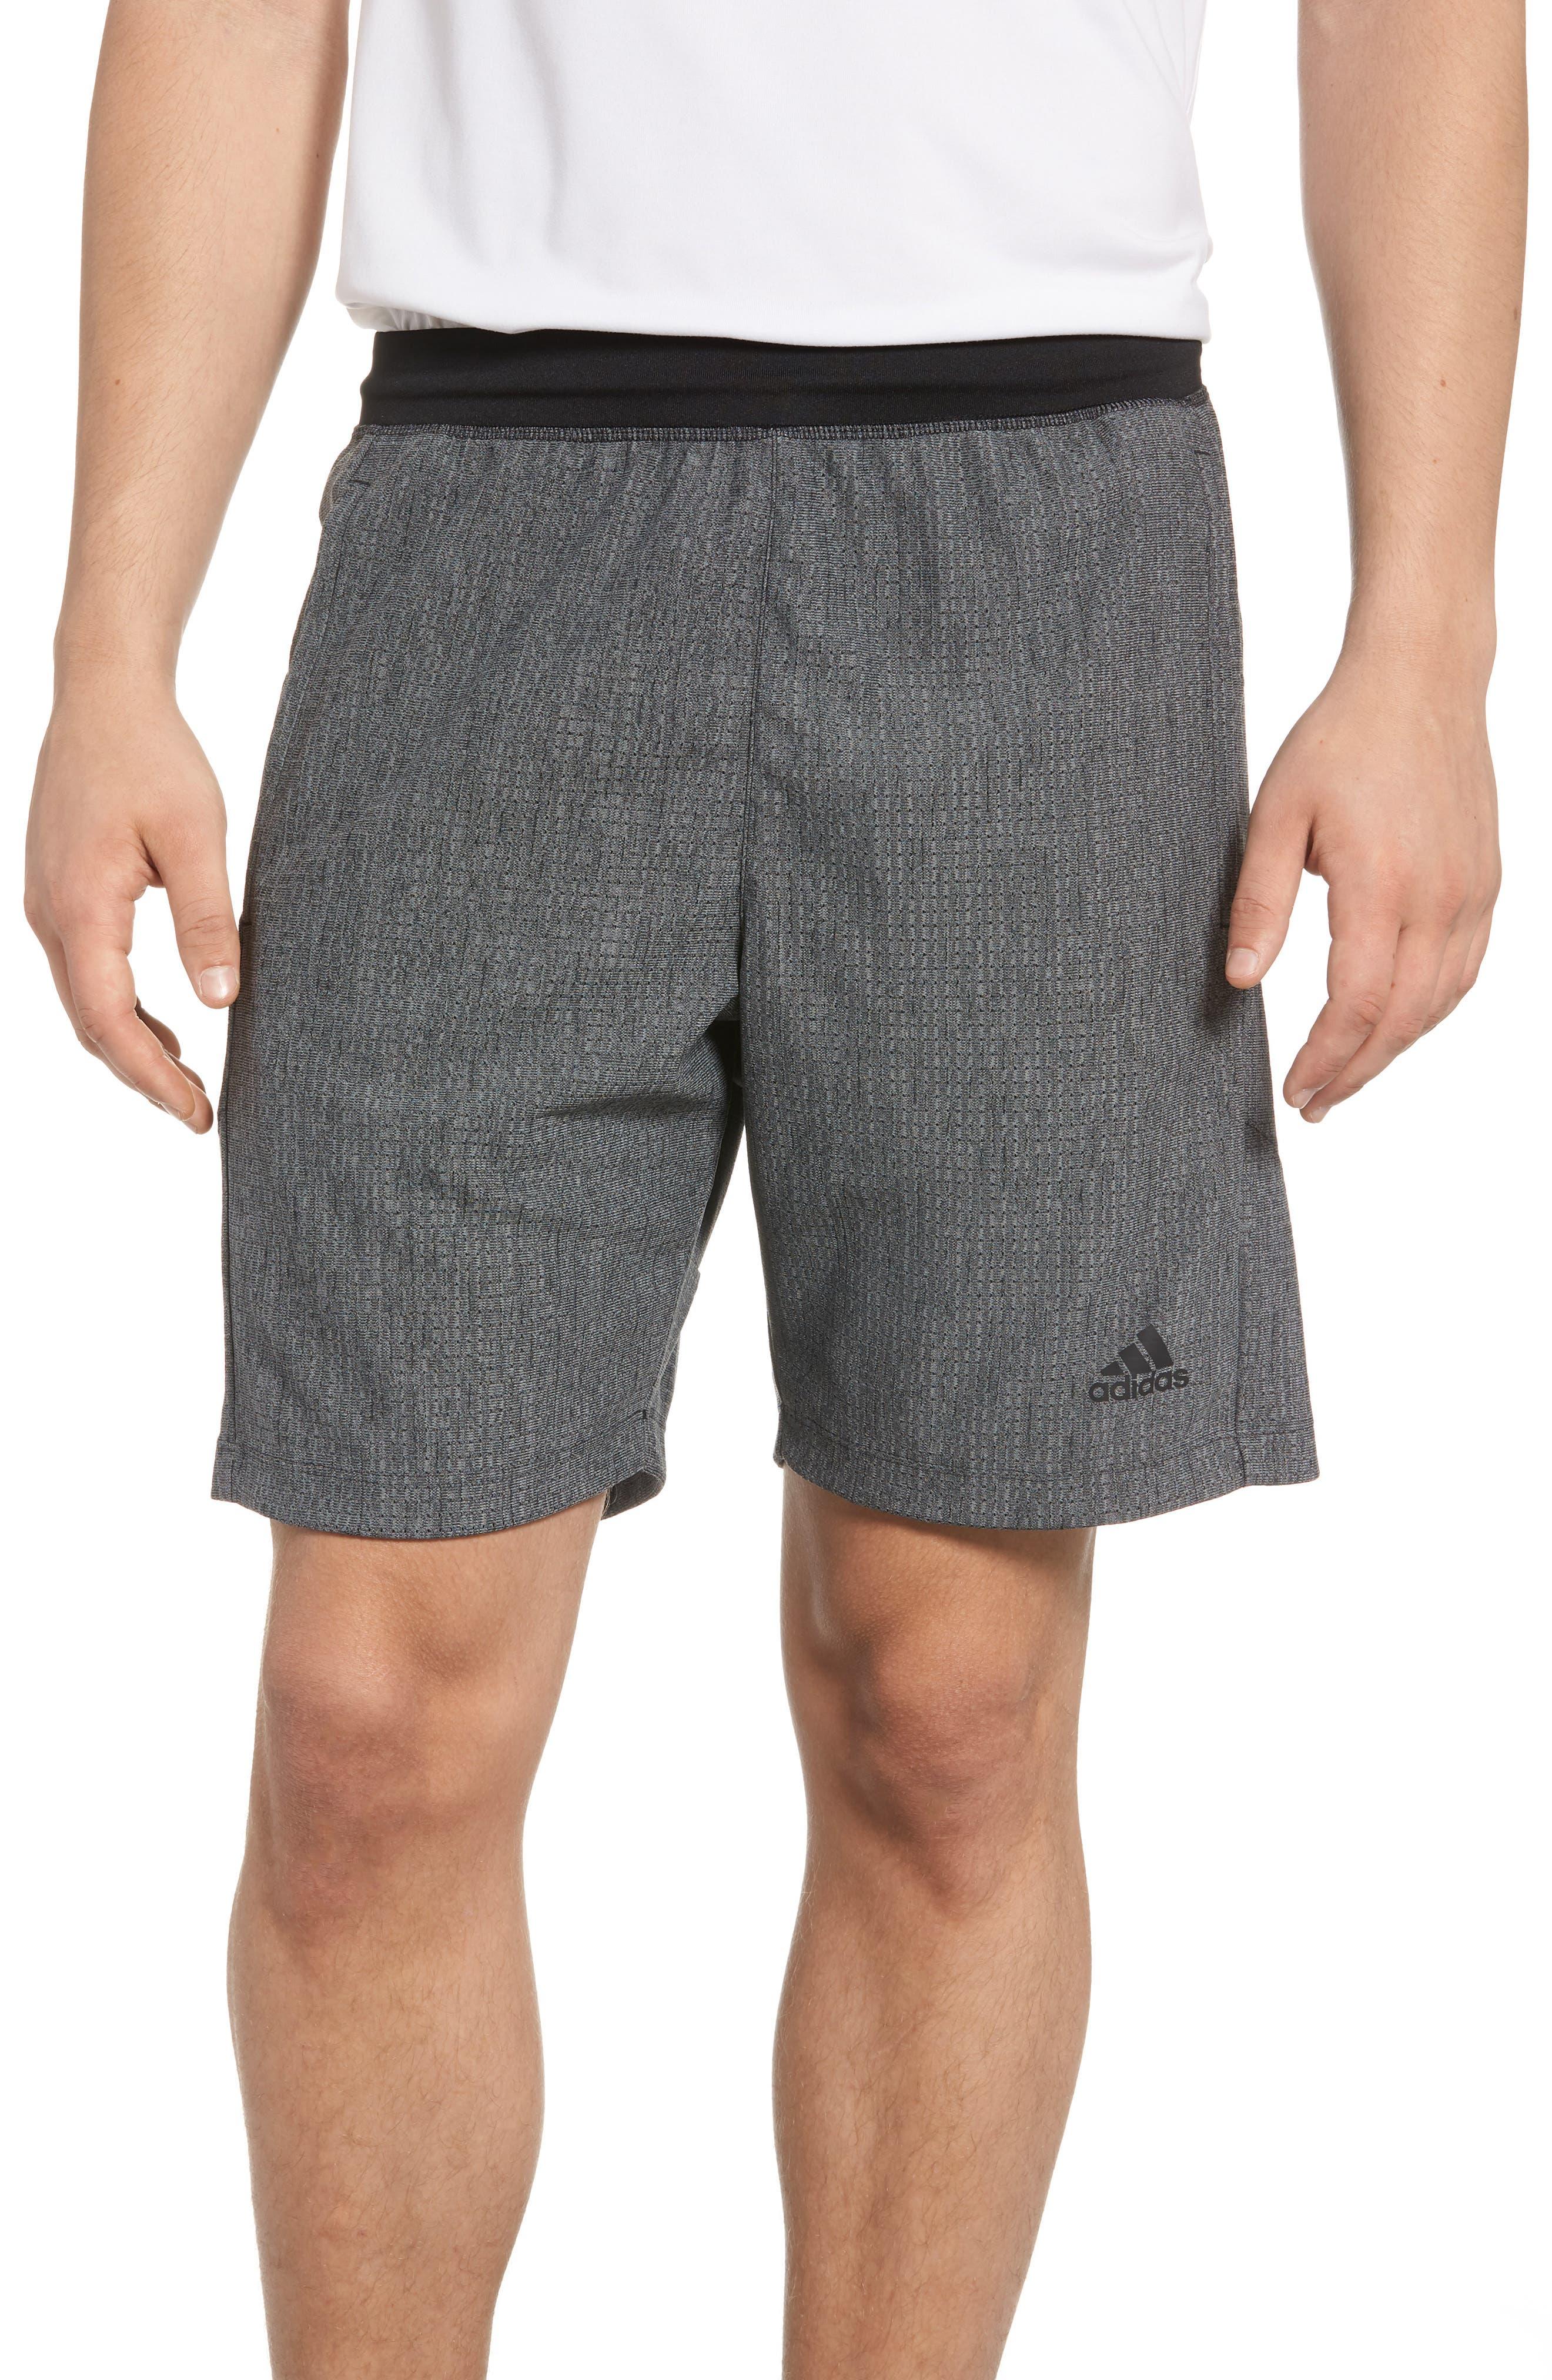 Speedbreaker Shorts,                             Main thumbnail 1, color,                             036